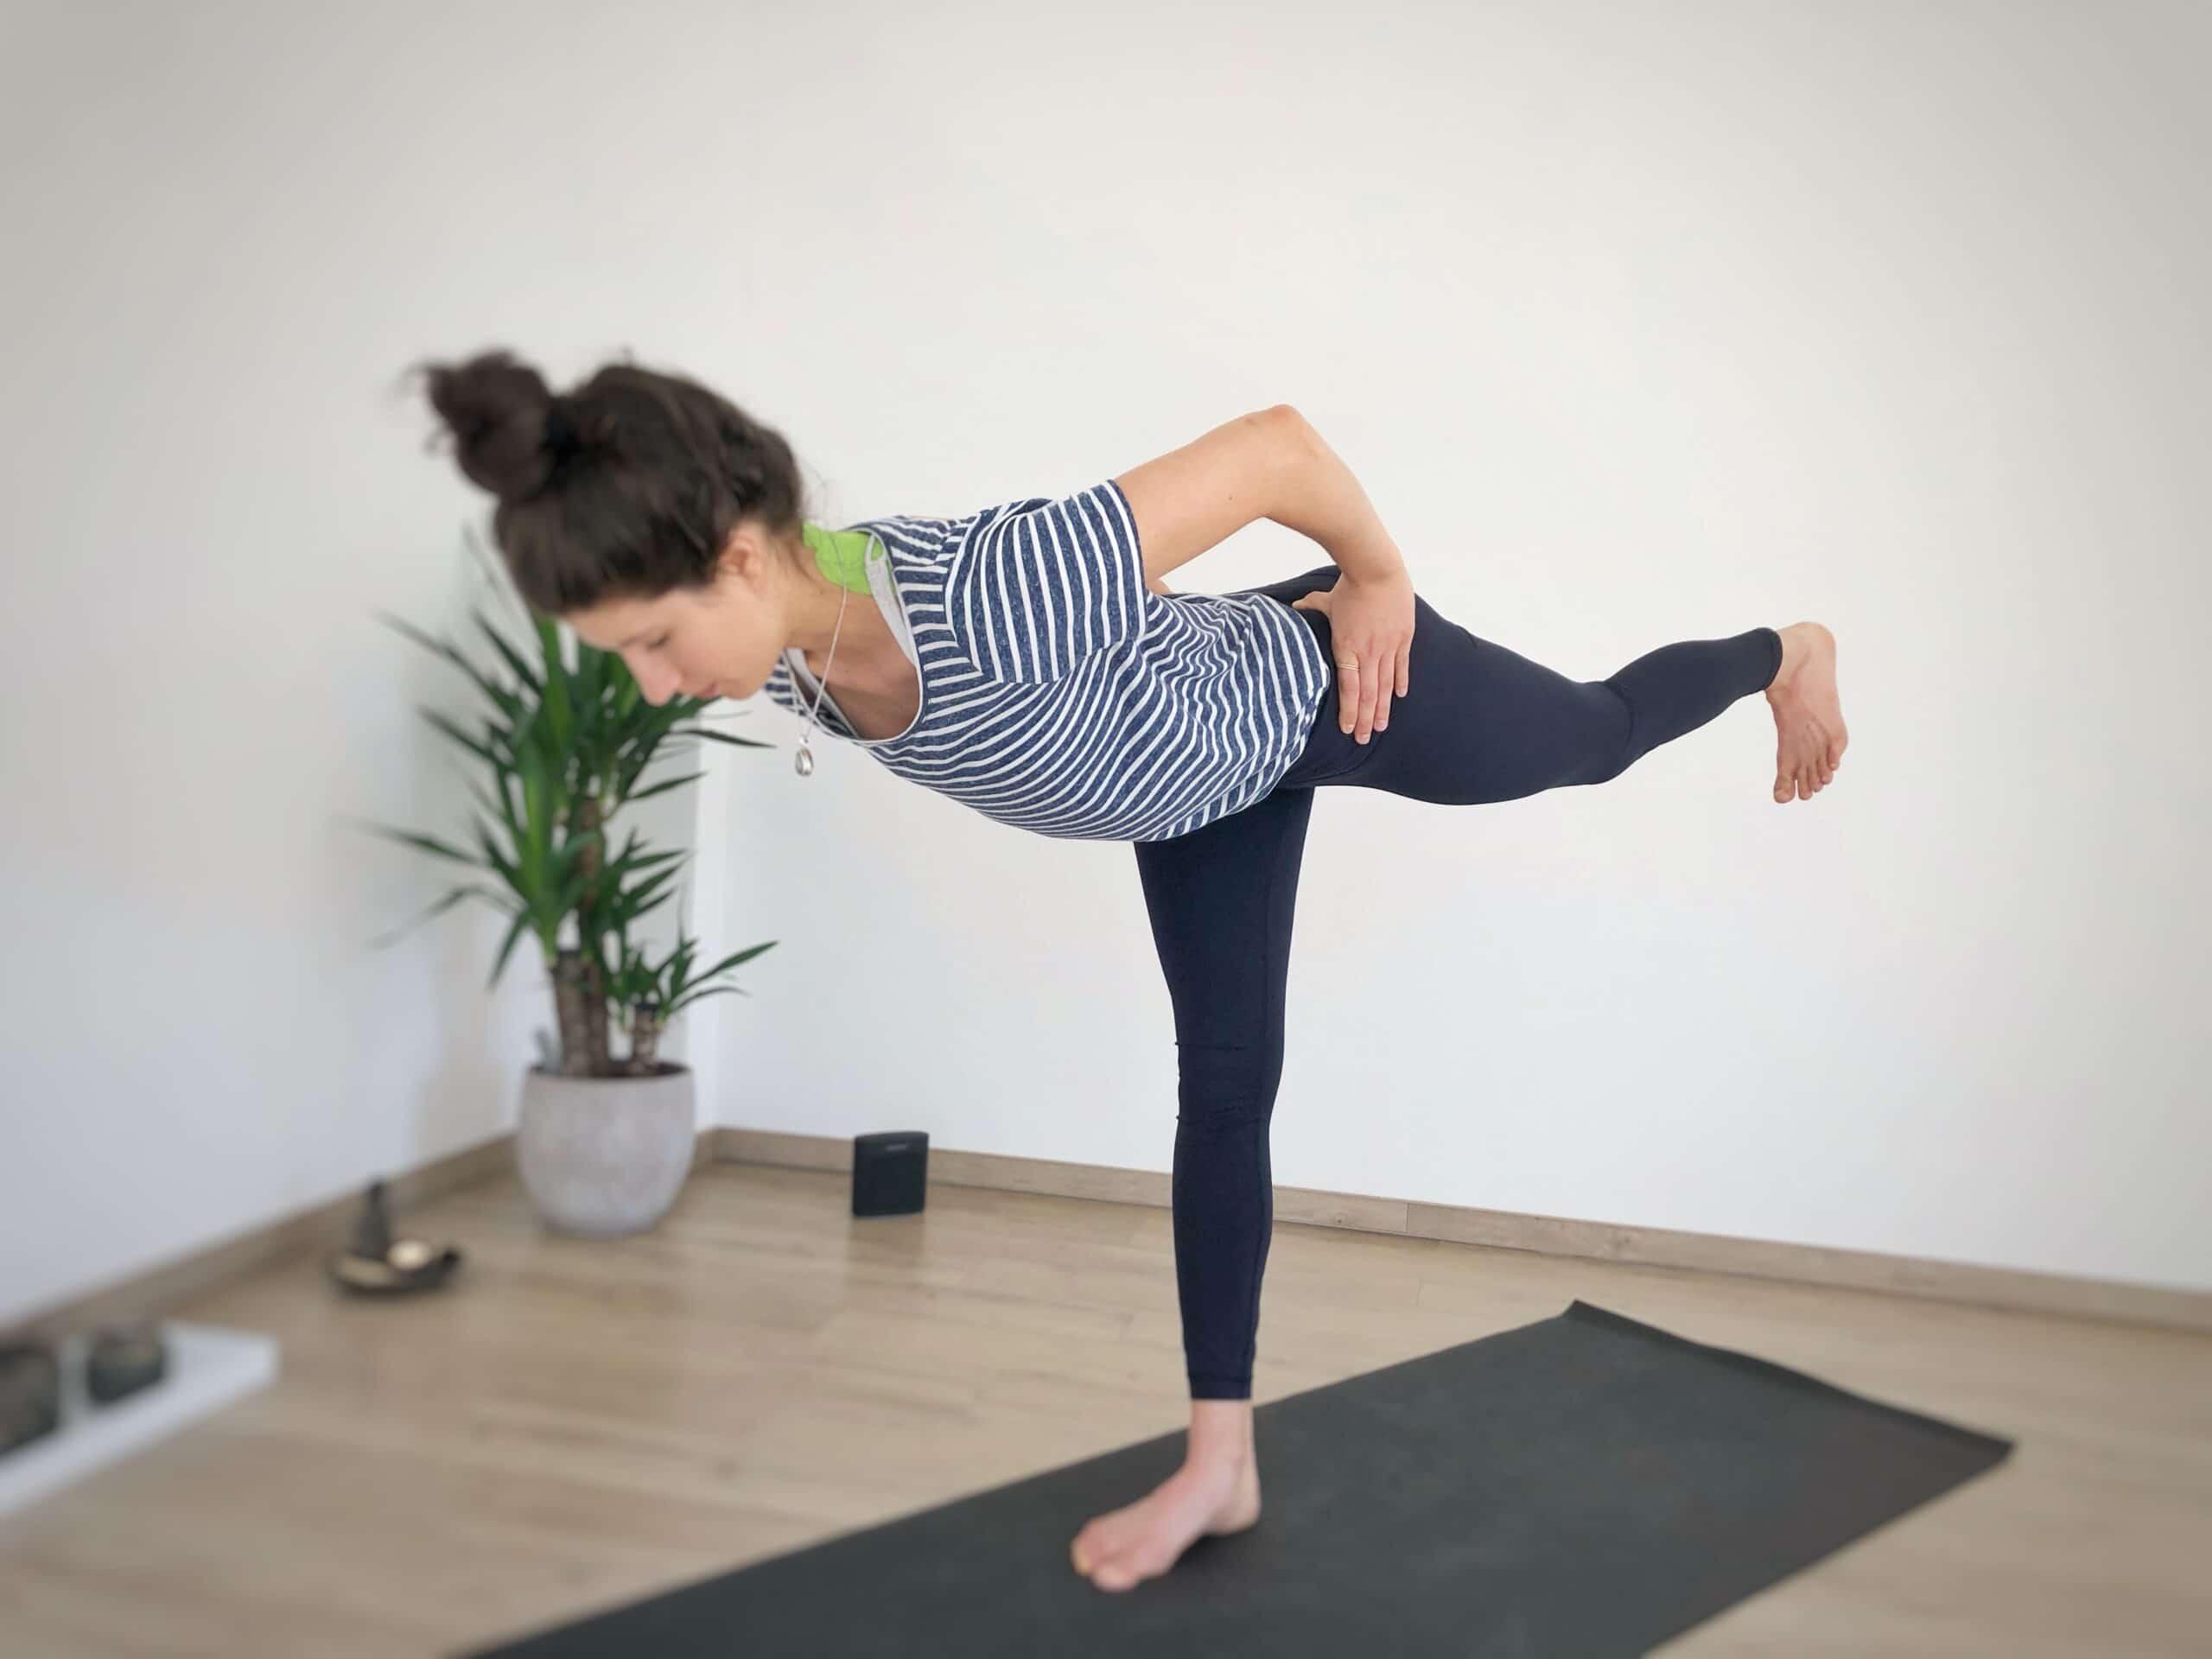 Krieger 3 mit Yoga Selfassists am Becken